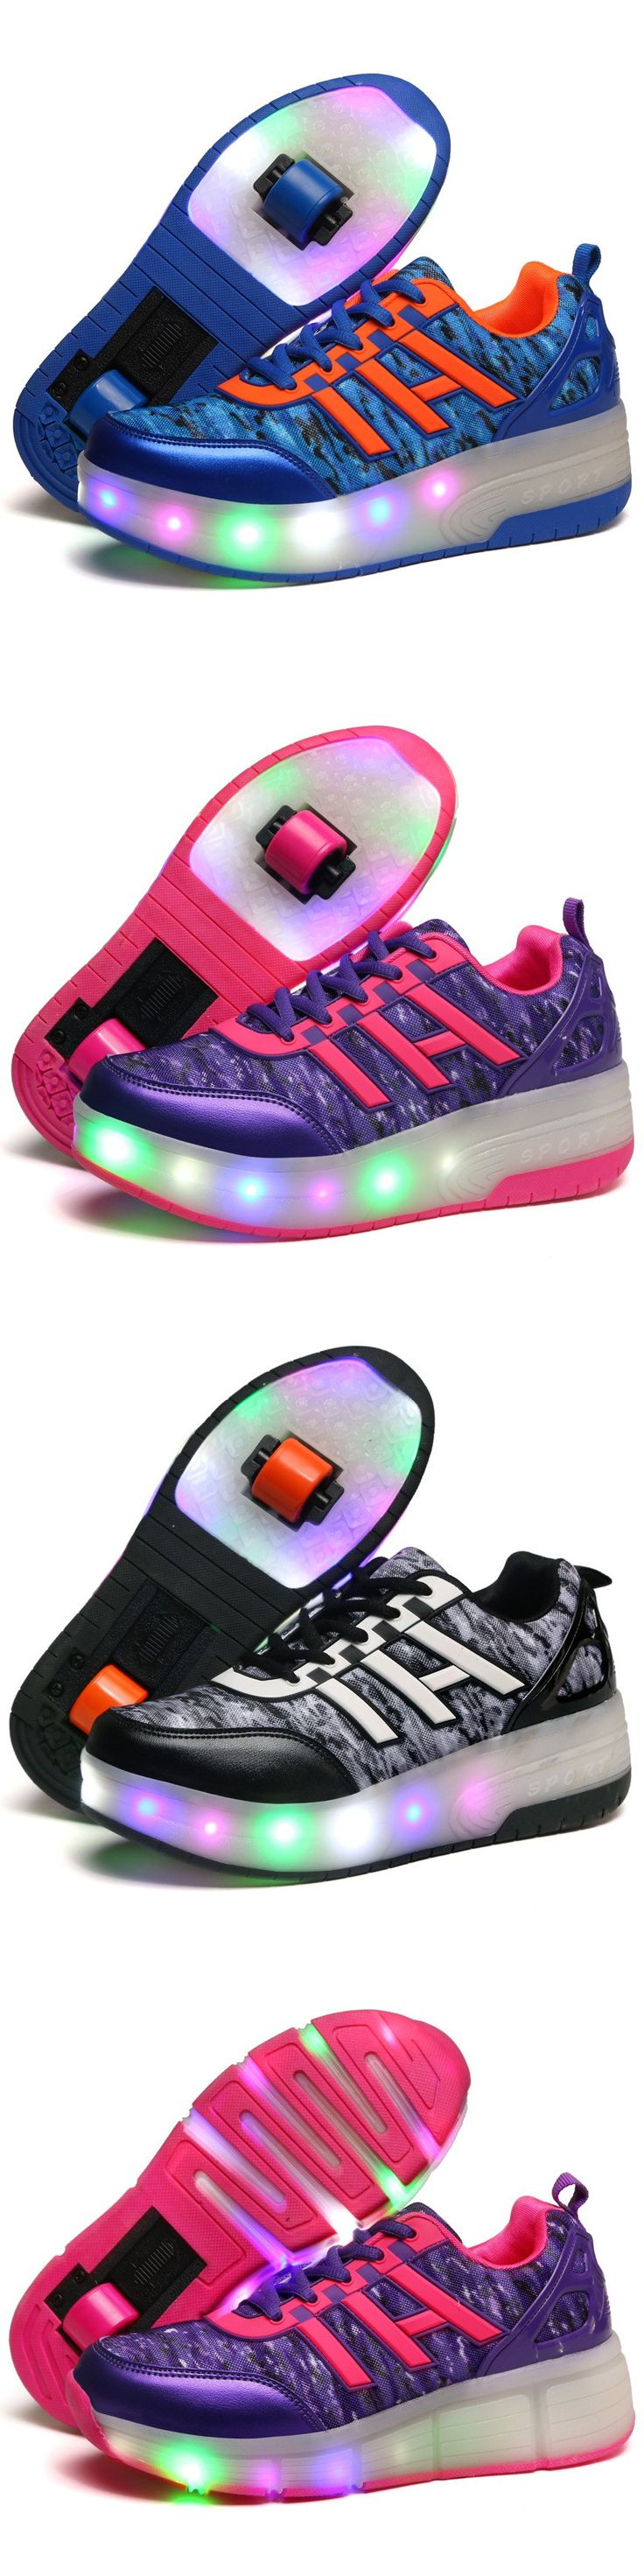 Skate shoes types - 2017 Children Led Heelys Roller Skate Shoes With Wheels Girls Boys Light Wheelys Kids Shoes Pink Black Jazzy Junior Sneakers